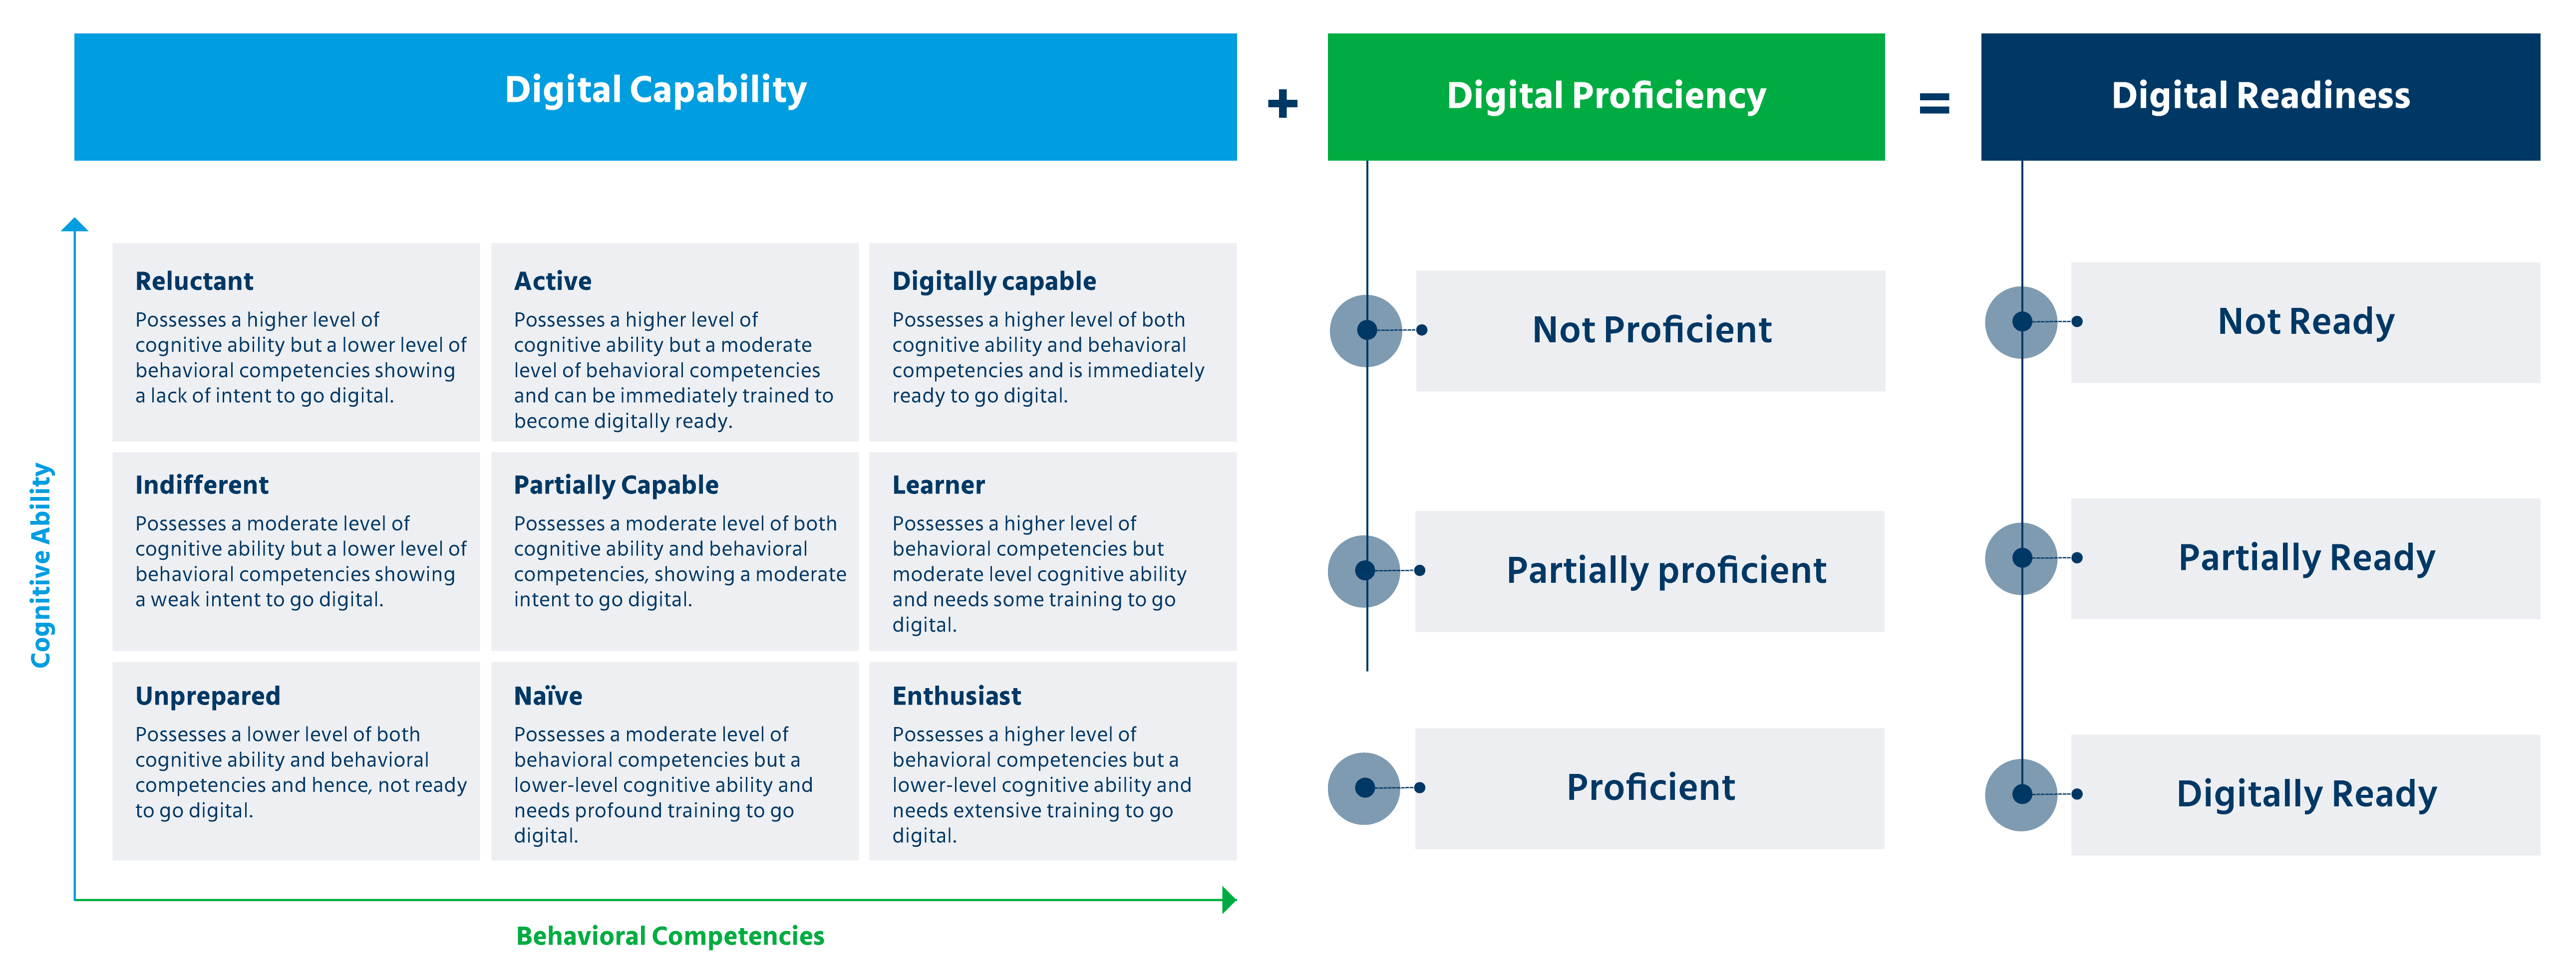 Digital readiness_infographic 4